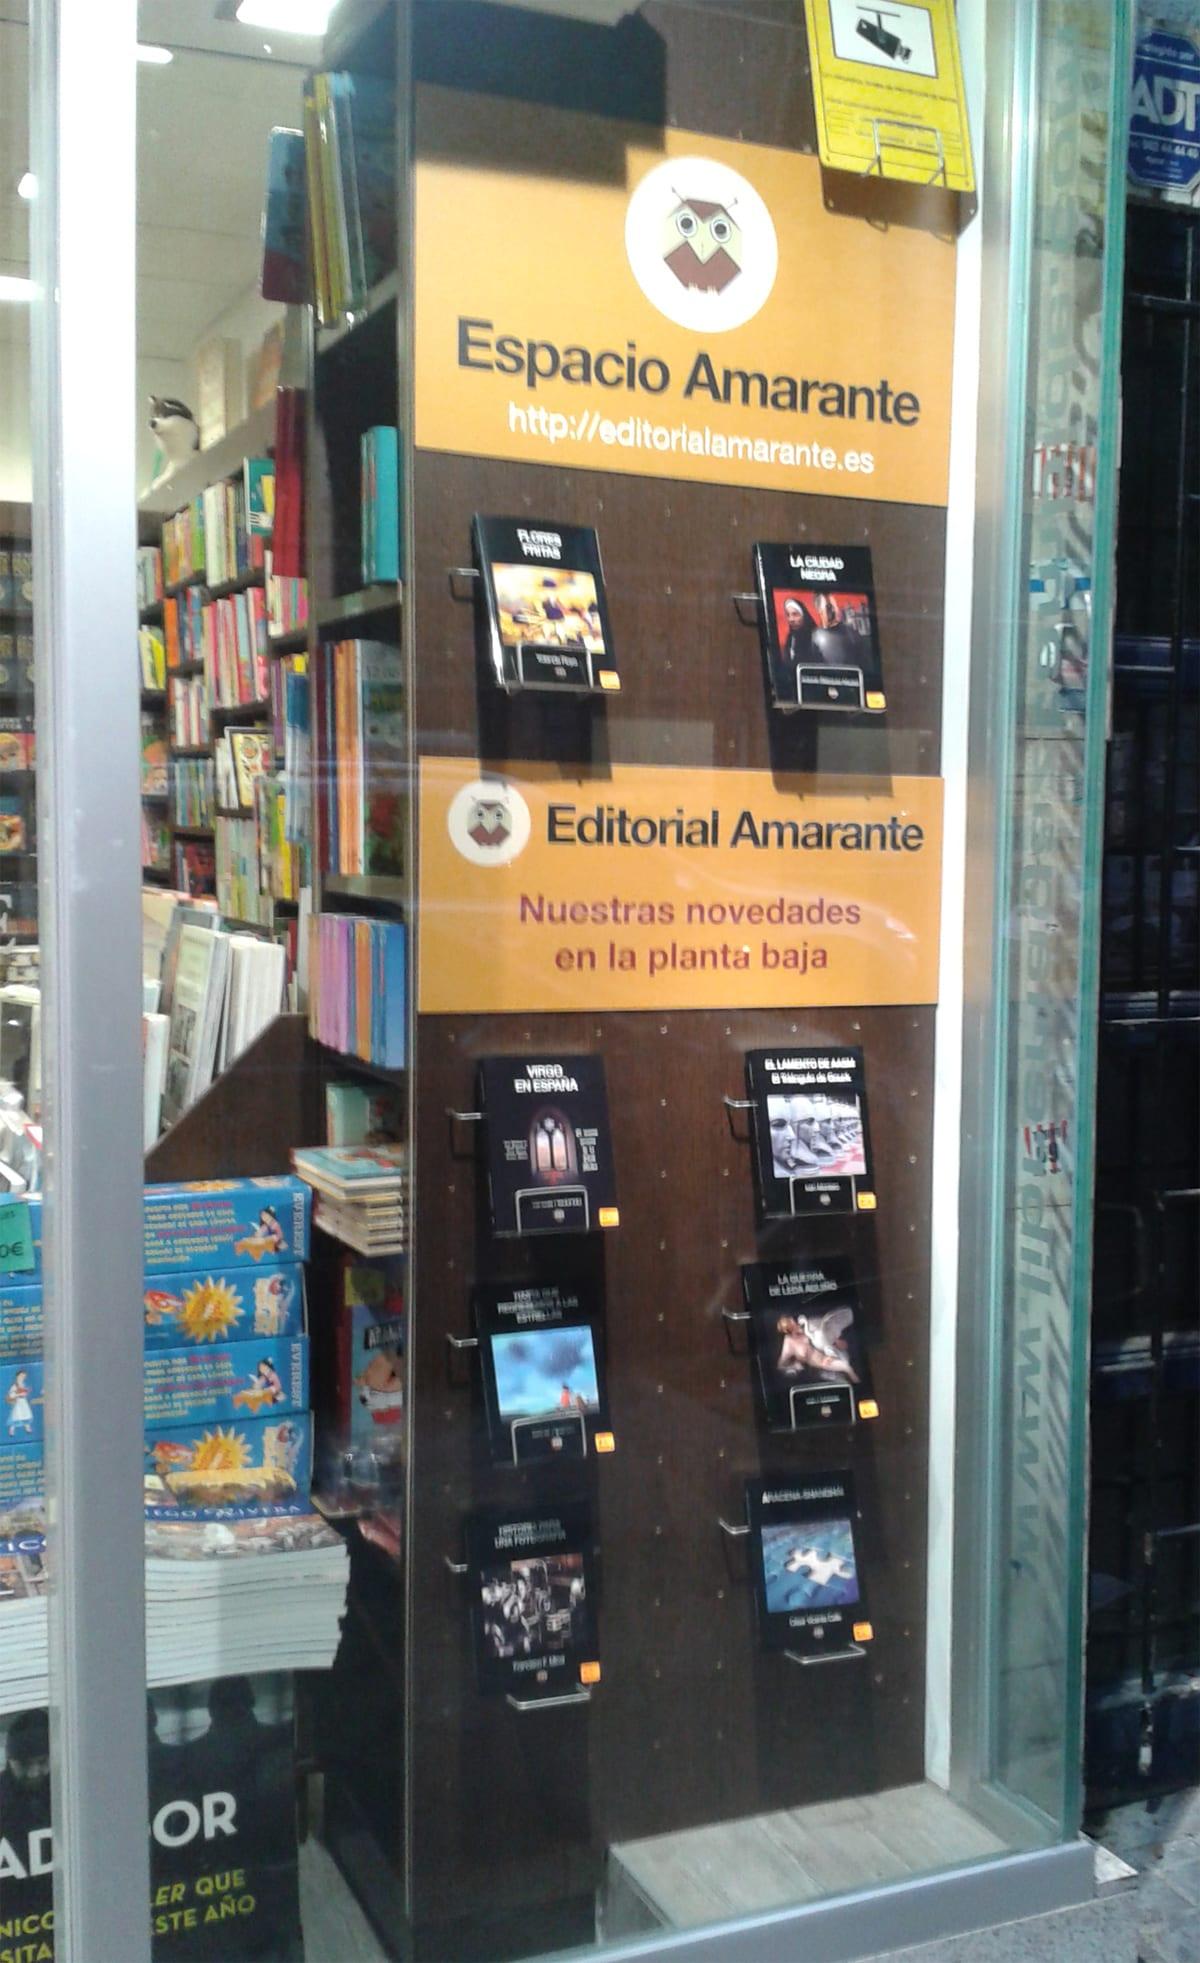 Espacio Amarante - Librería Gaztambide